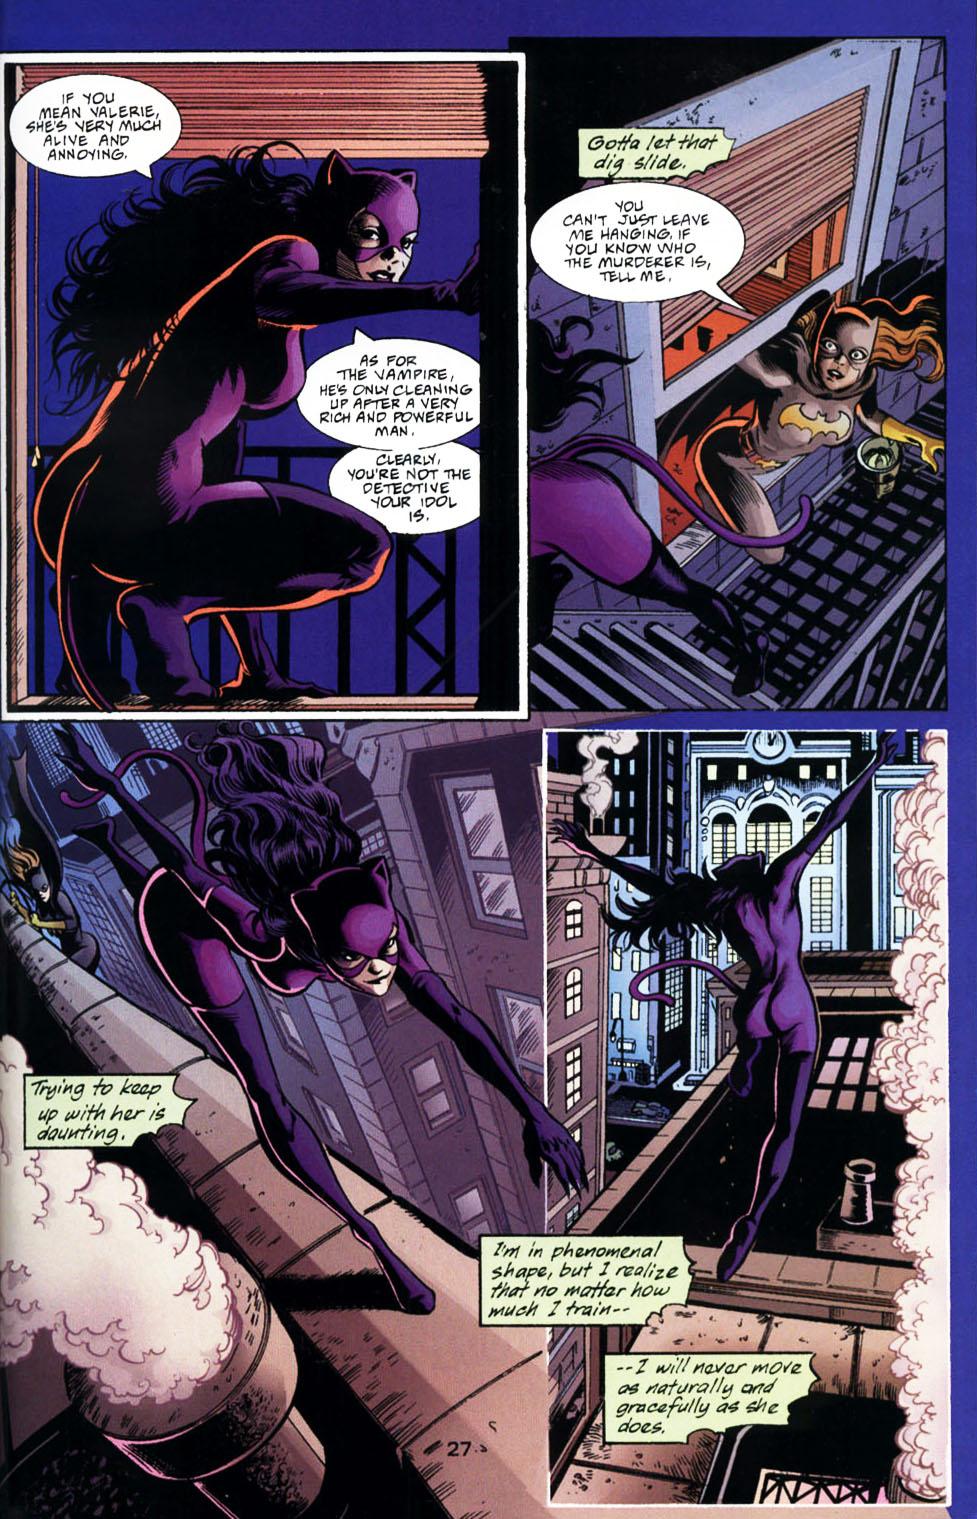 Birds Of Prey - Batgirl-Catwoman 1-27 SelinaKyle BarbaraGordon.jpg